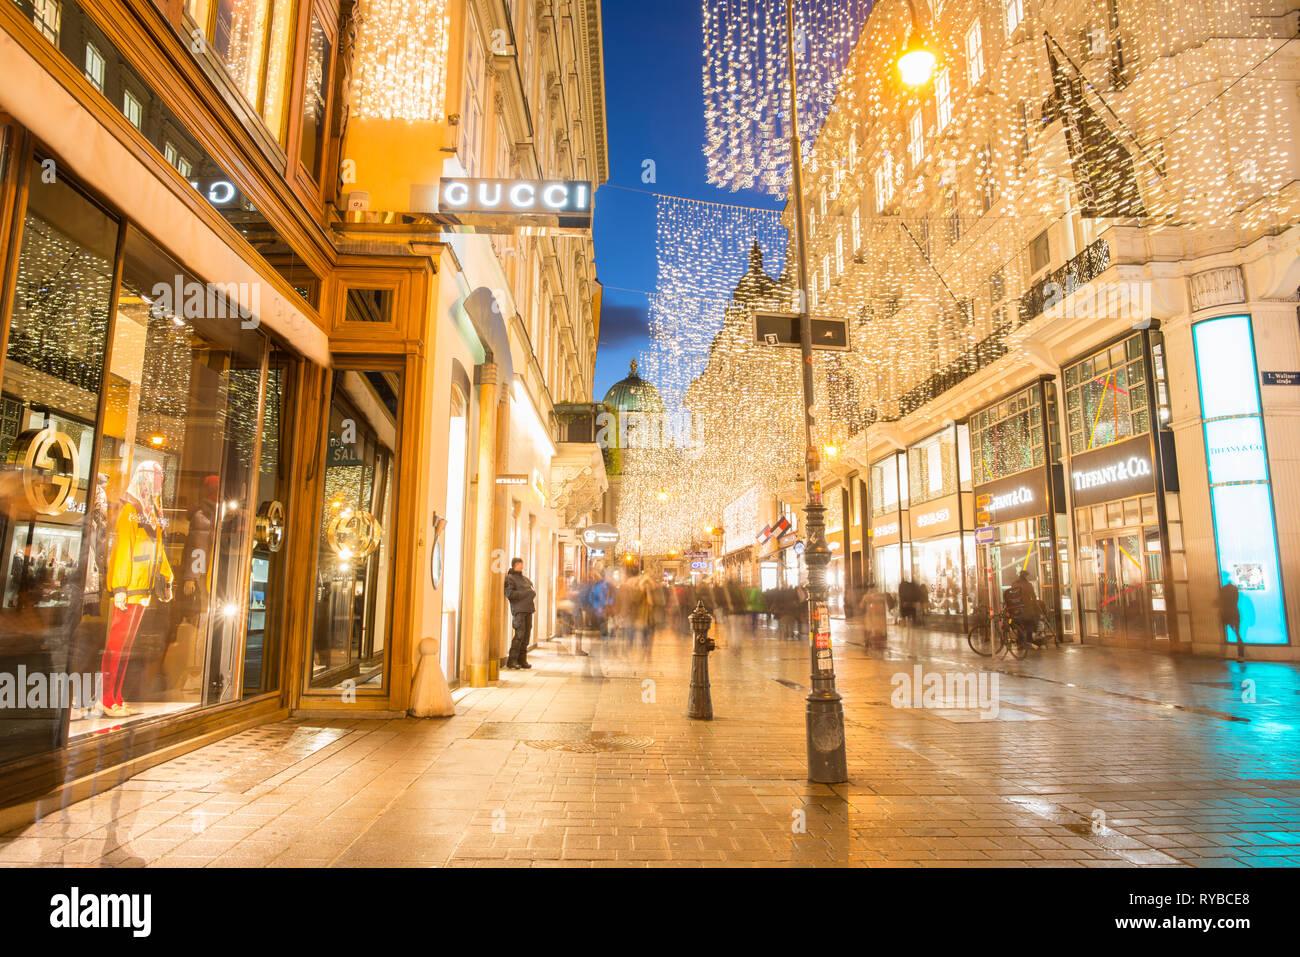 Upmarket Kohlmarkt with Hofburg palace to the rear, in Vienna city centre after dark, Austria. - Stock Image